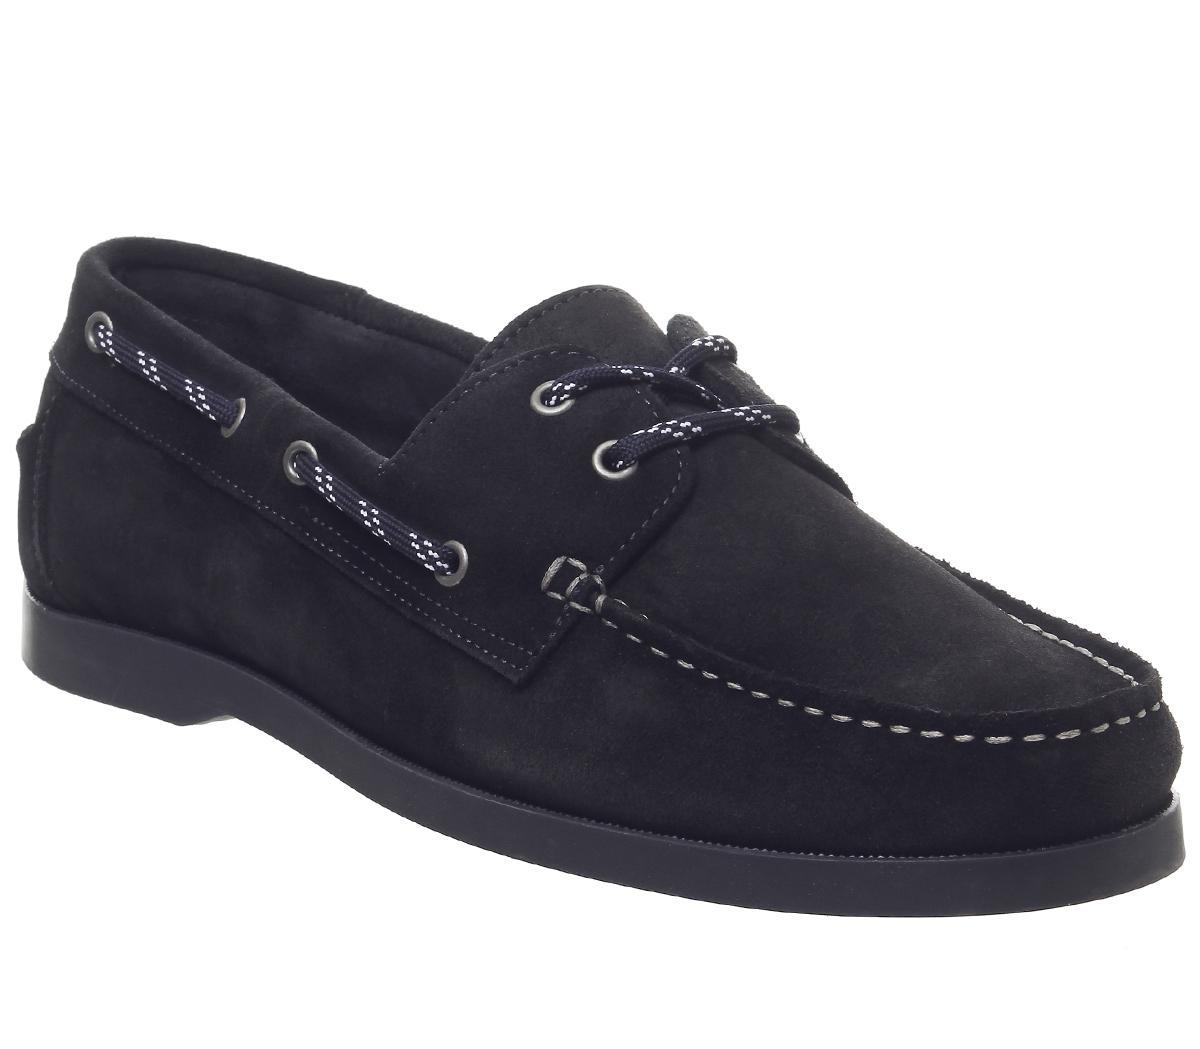 Latitude Boat Shoes